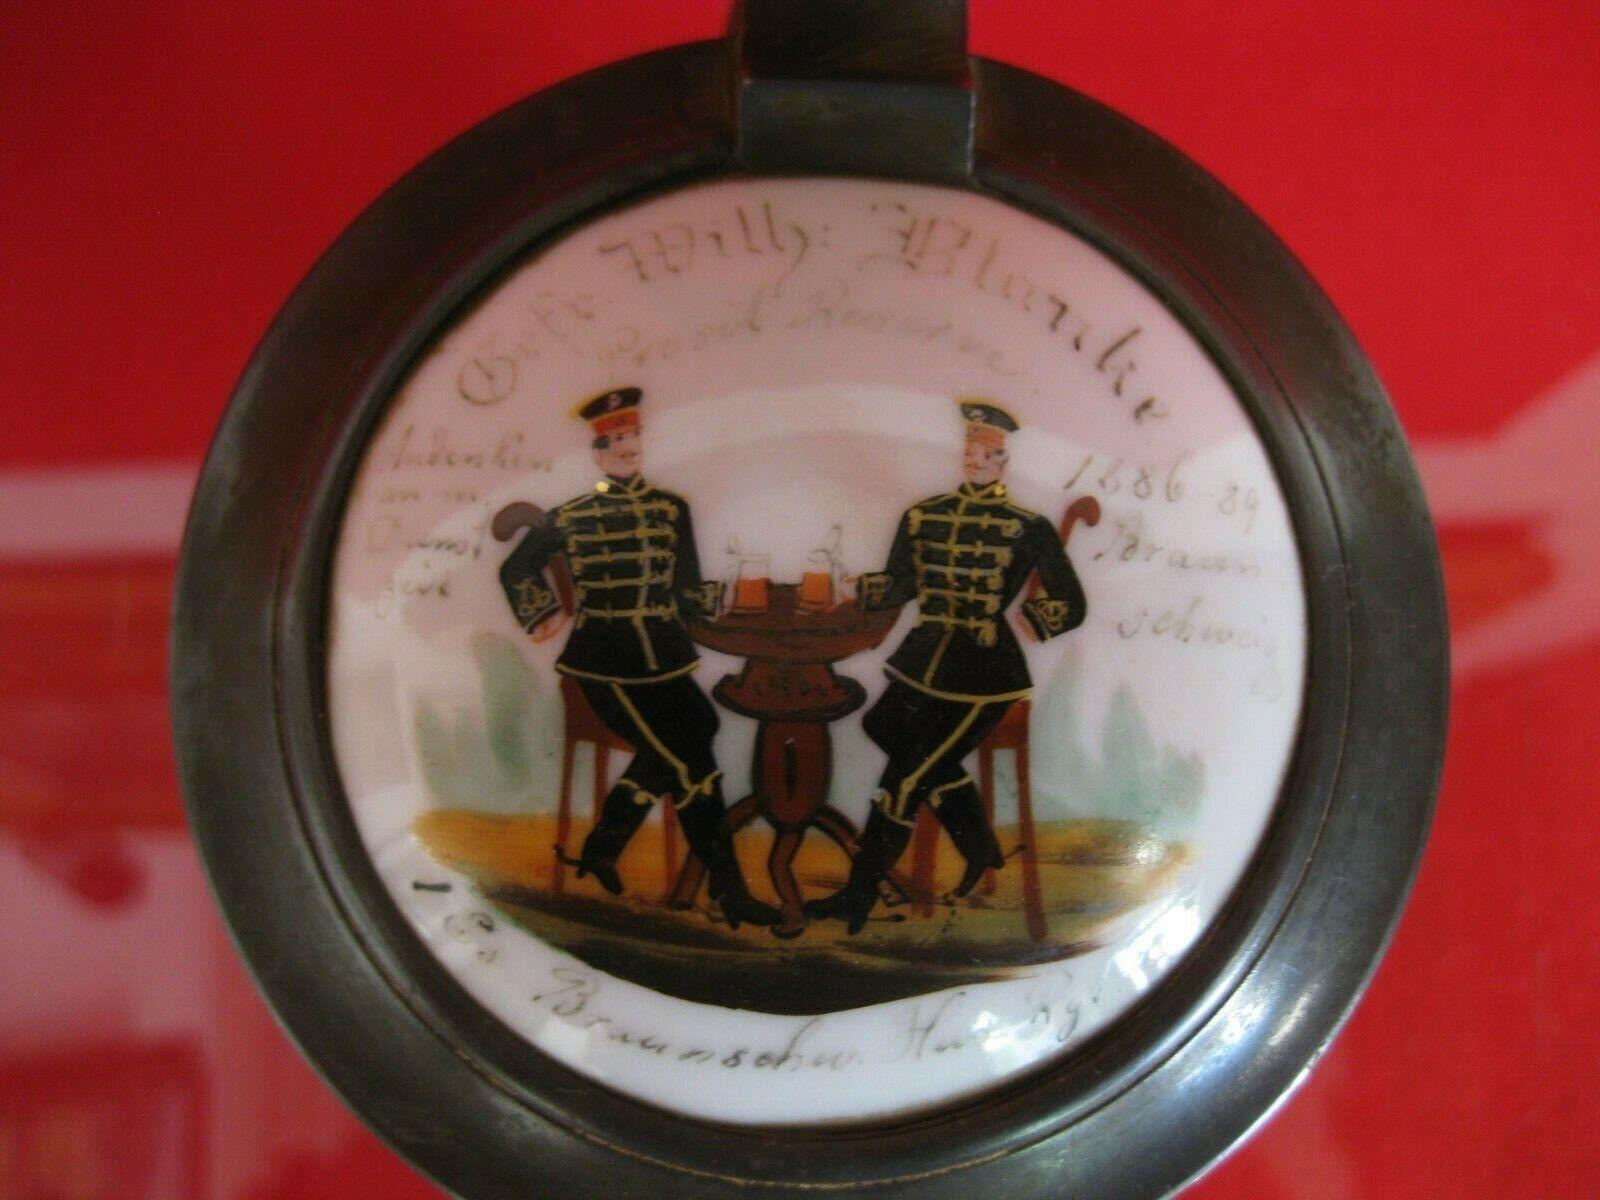 Reservistenkrug Krug Reservistika marronschweig HUSSARD Régiment 17 1886 verre